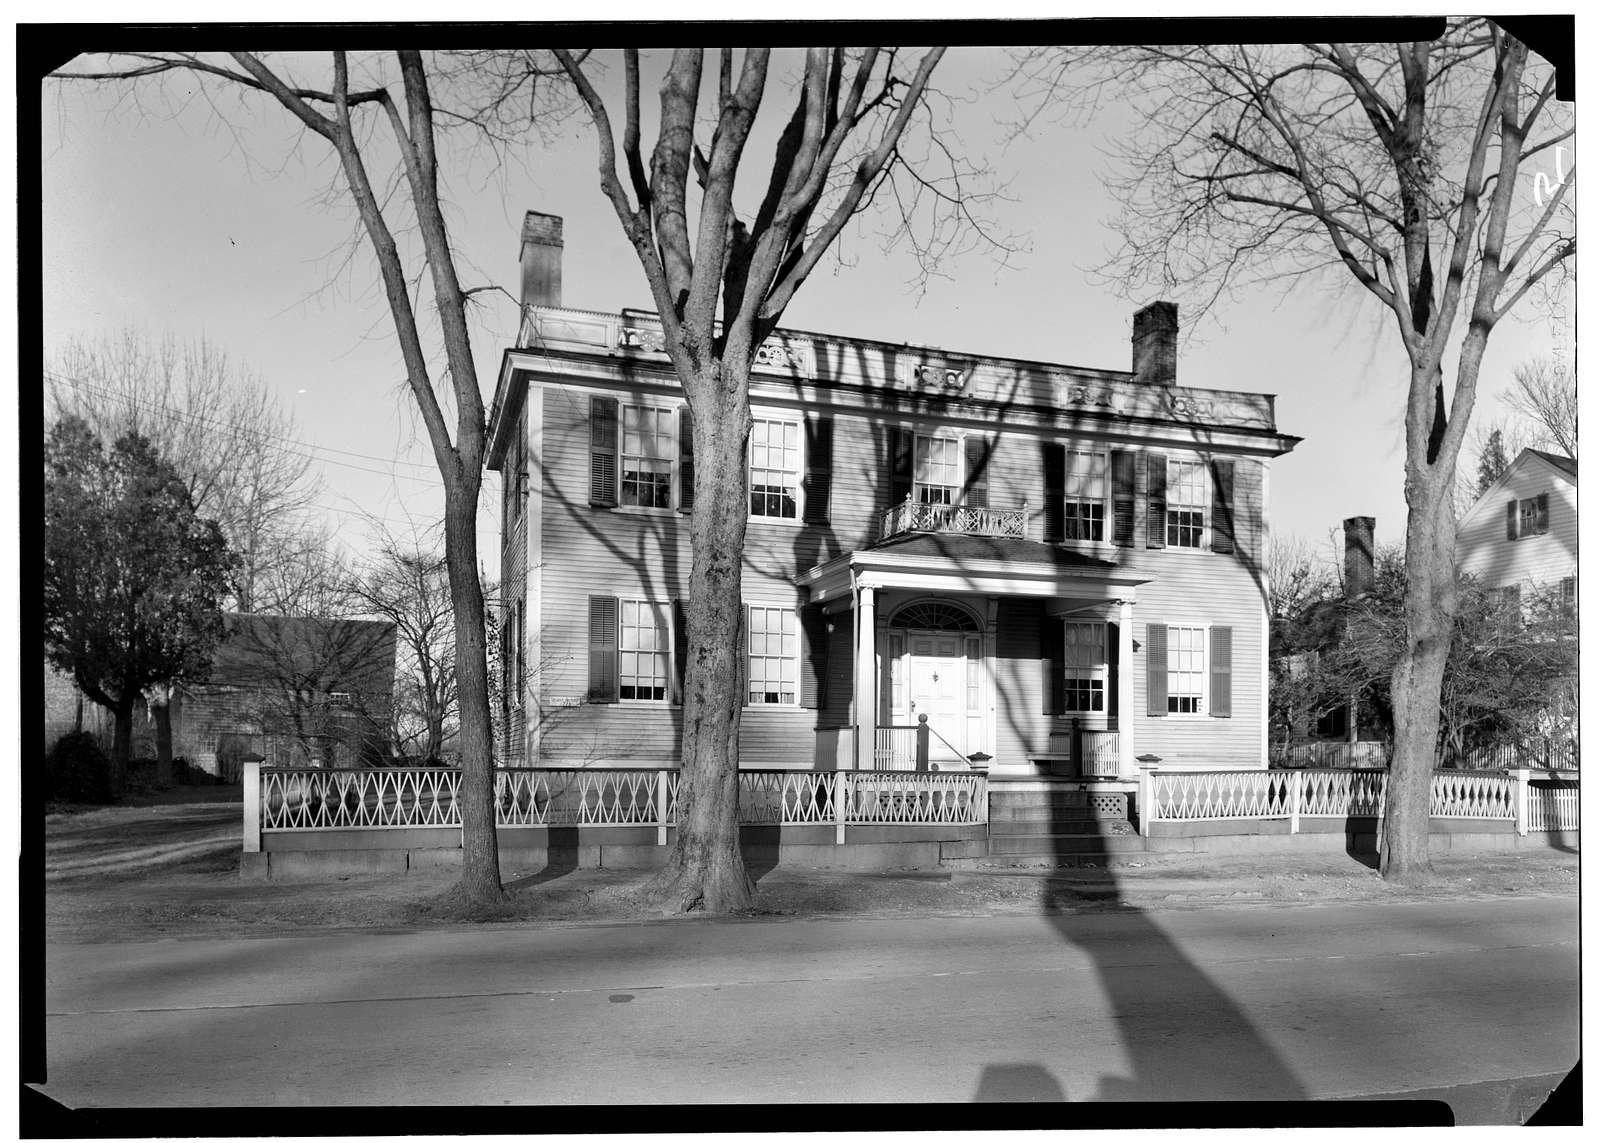 Thomas Stafford Taylor House, 1305 Kingstown Road (State Route 138), Kingston, Washington County, RI